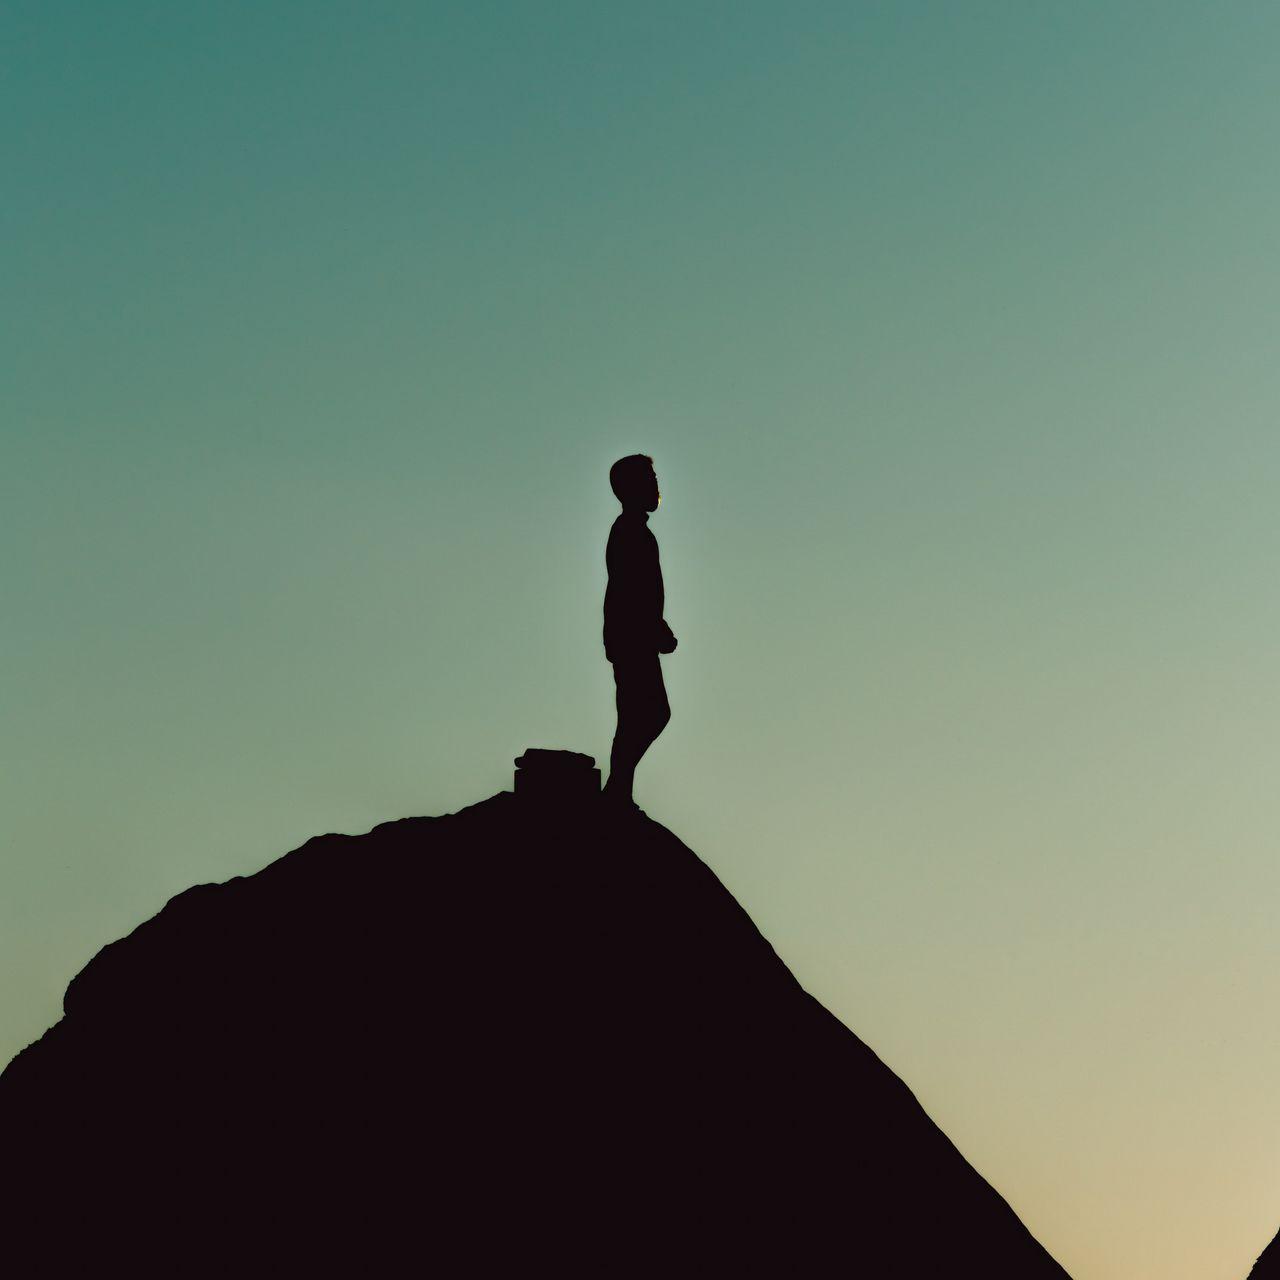 1280x1280 Wallpaper silhouette, alone, mountain, twilight, dark